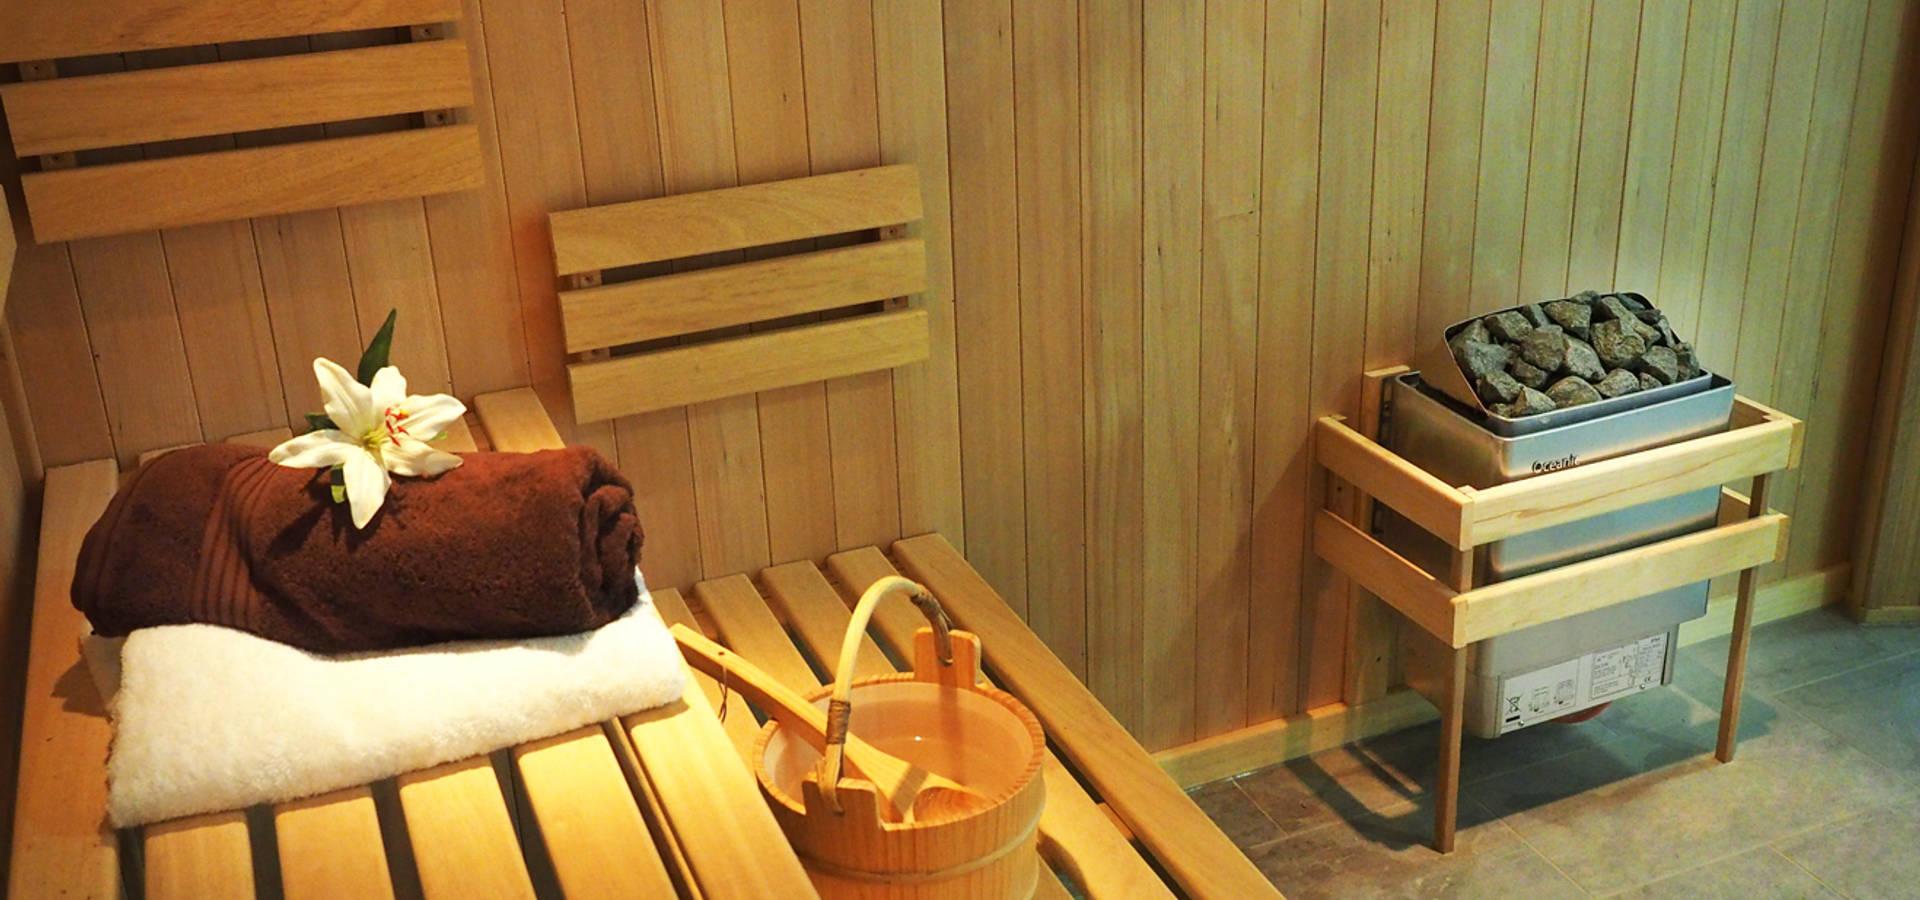 turkish steam room por oceanic saunas homify. Black Bedroom Furniture Sets. Home Design Ideas